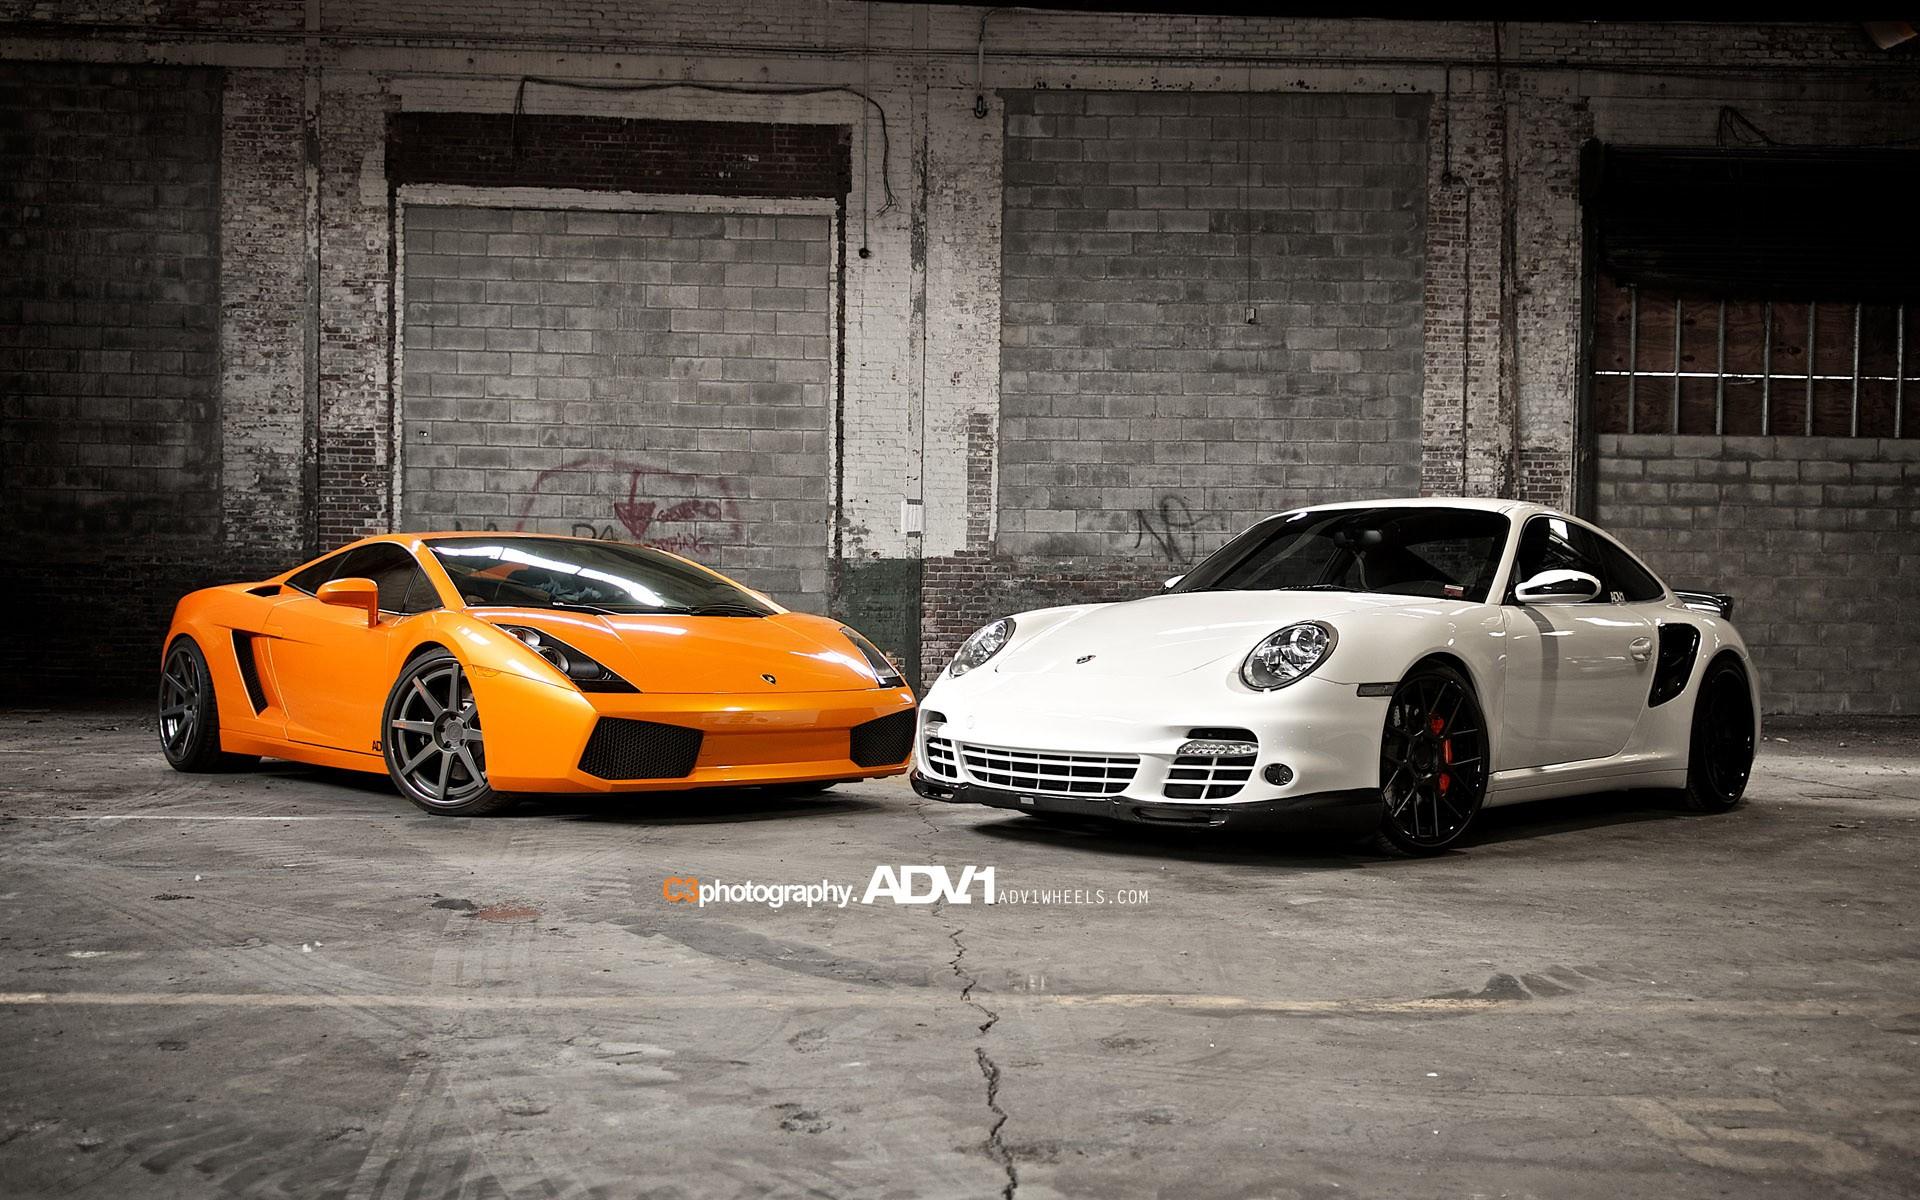 Lamborghini Gallardo and Porsche 997 TT Wallpaper | HD Car ...